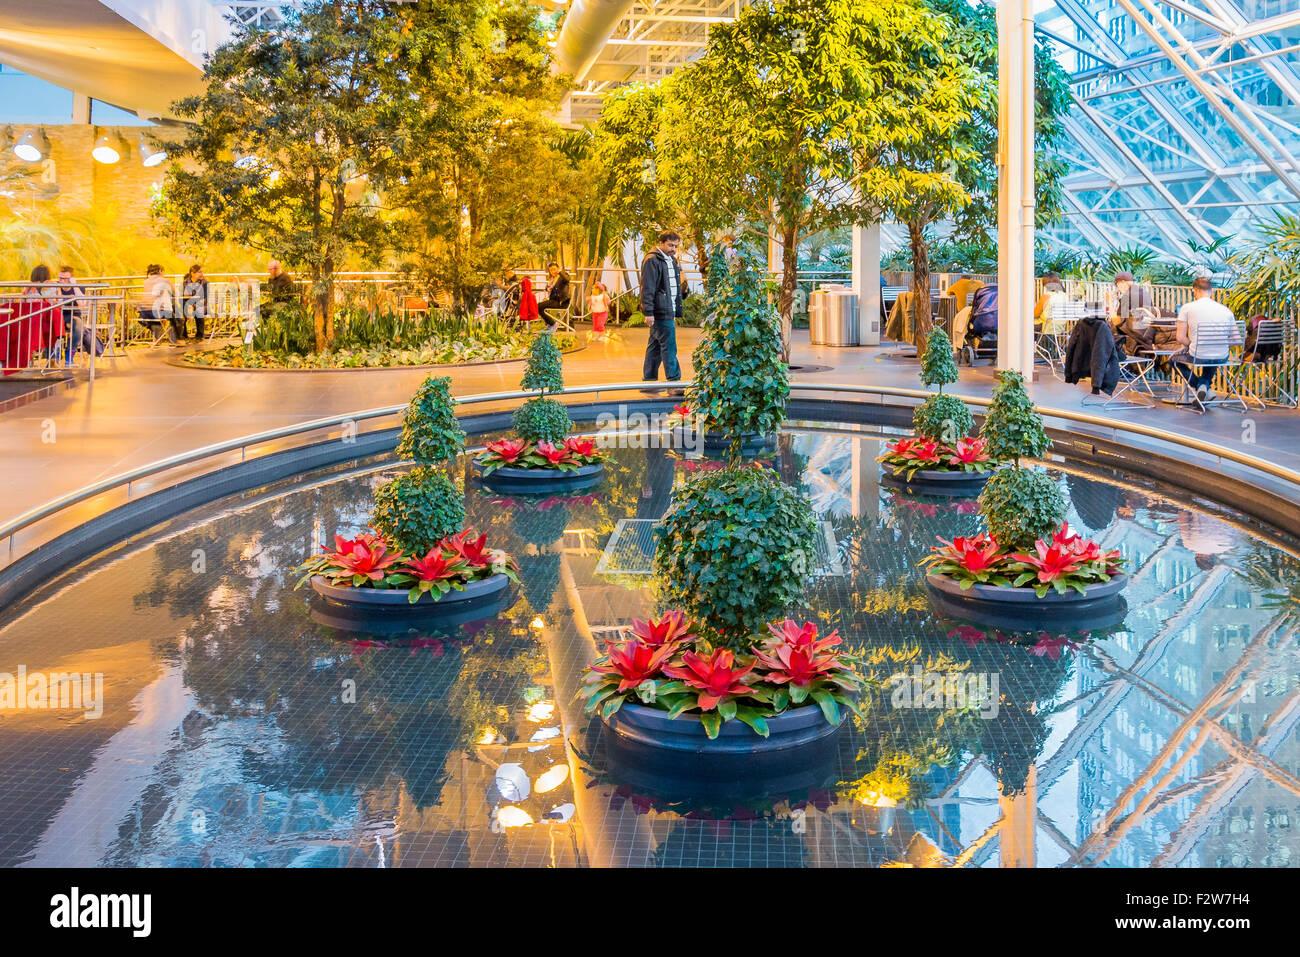 The Devonian Gardens, year round indoor Park, Calgary, Alberta, Canada - Stock Image